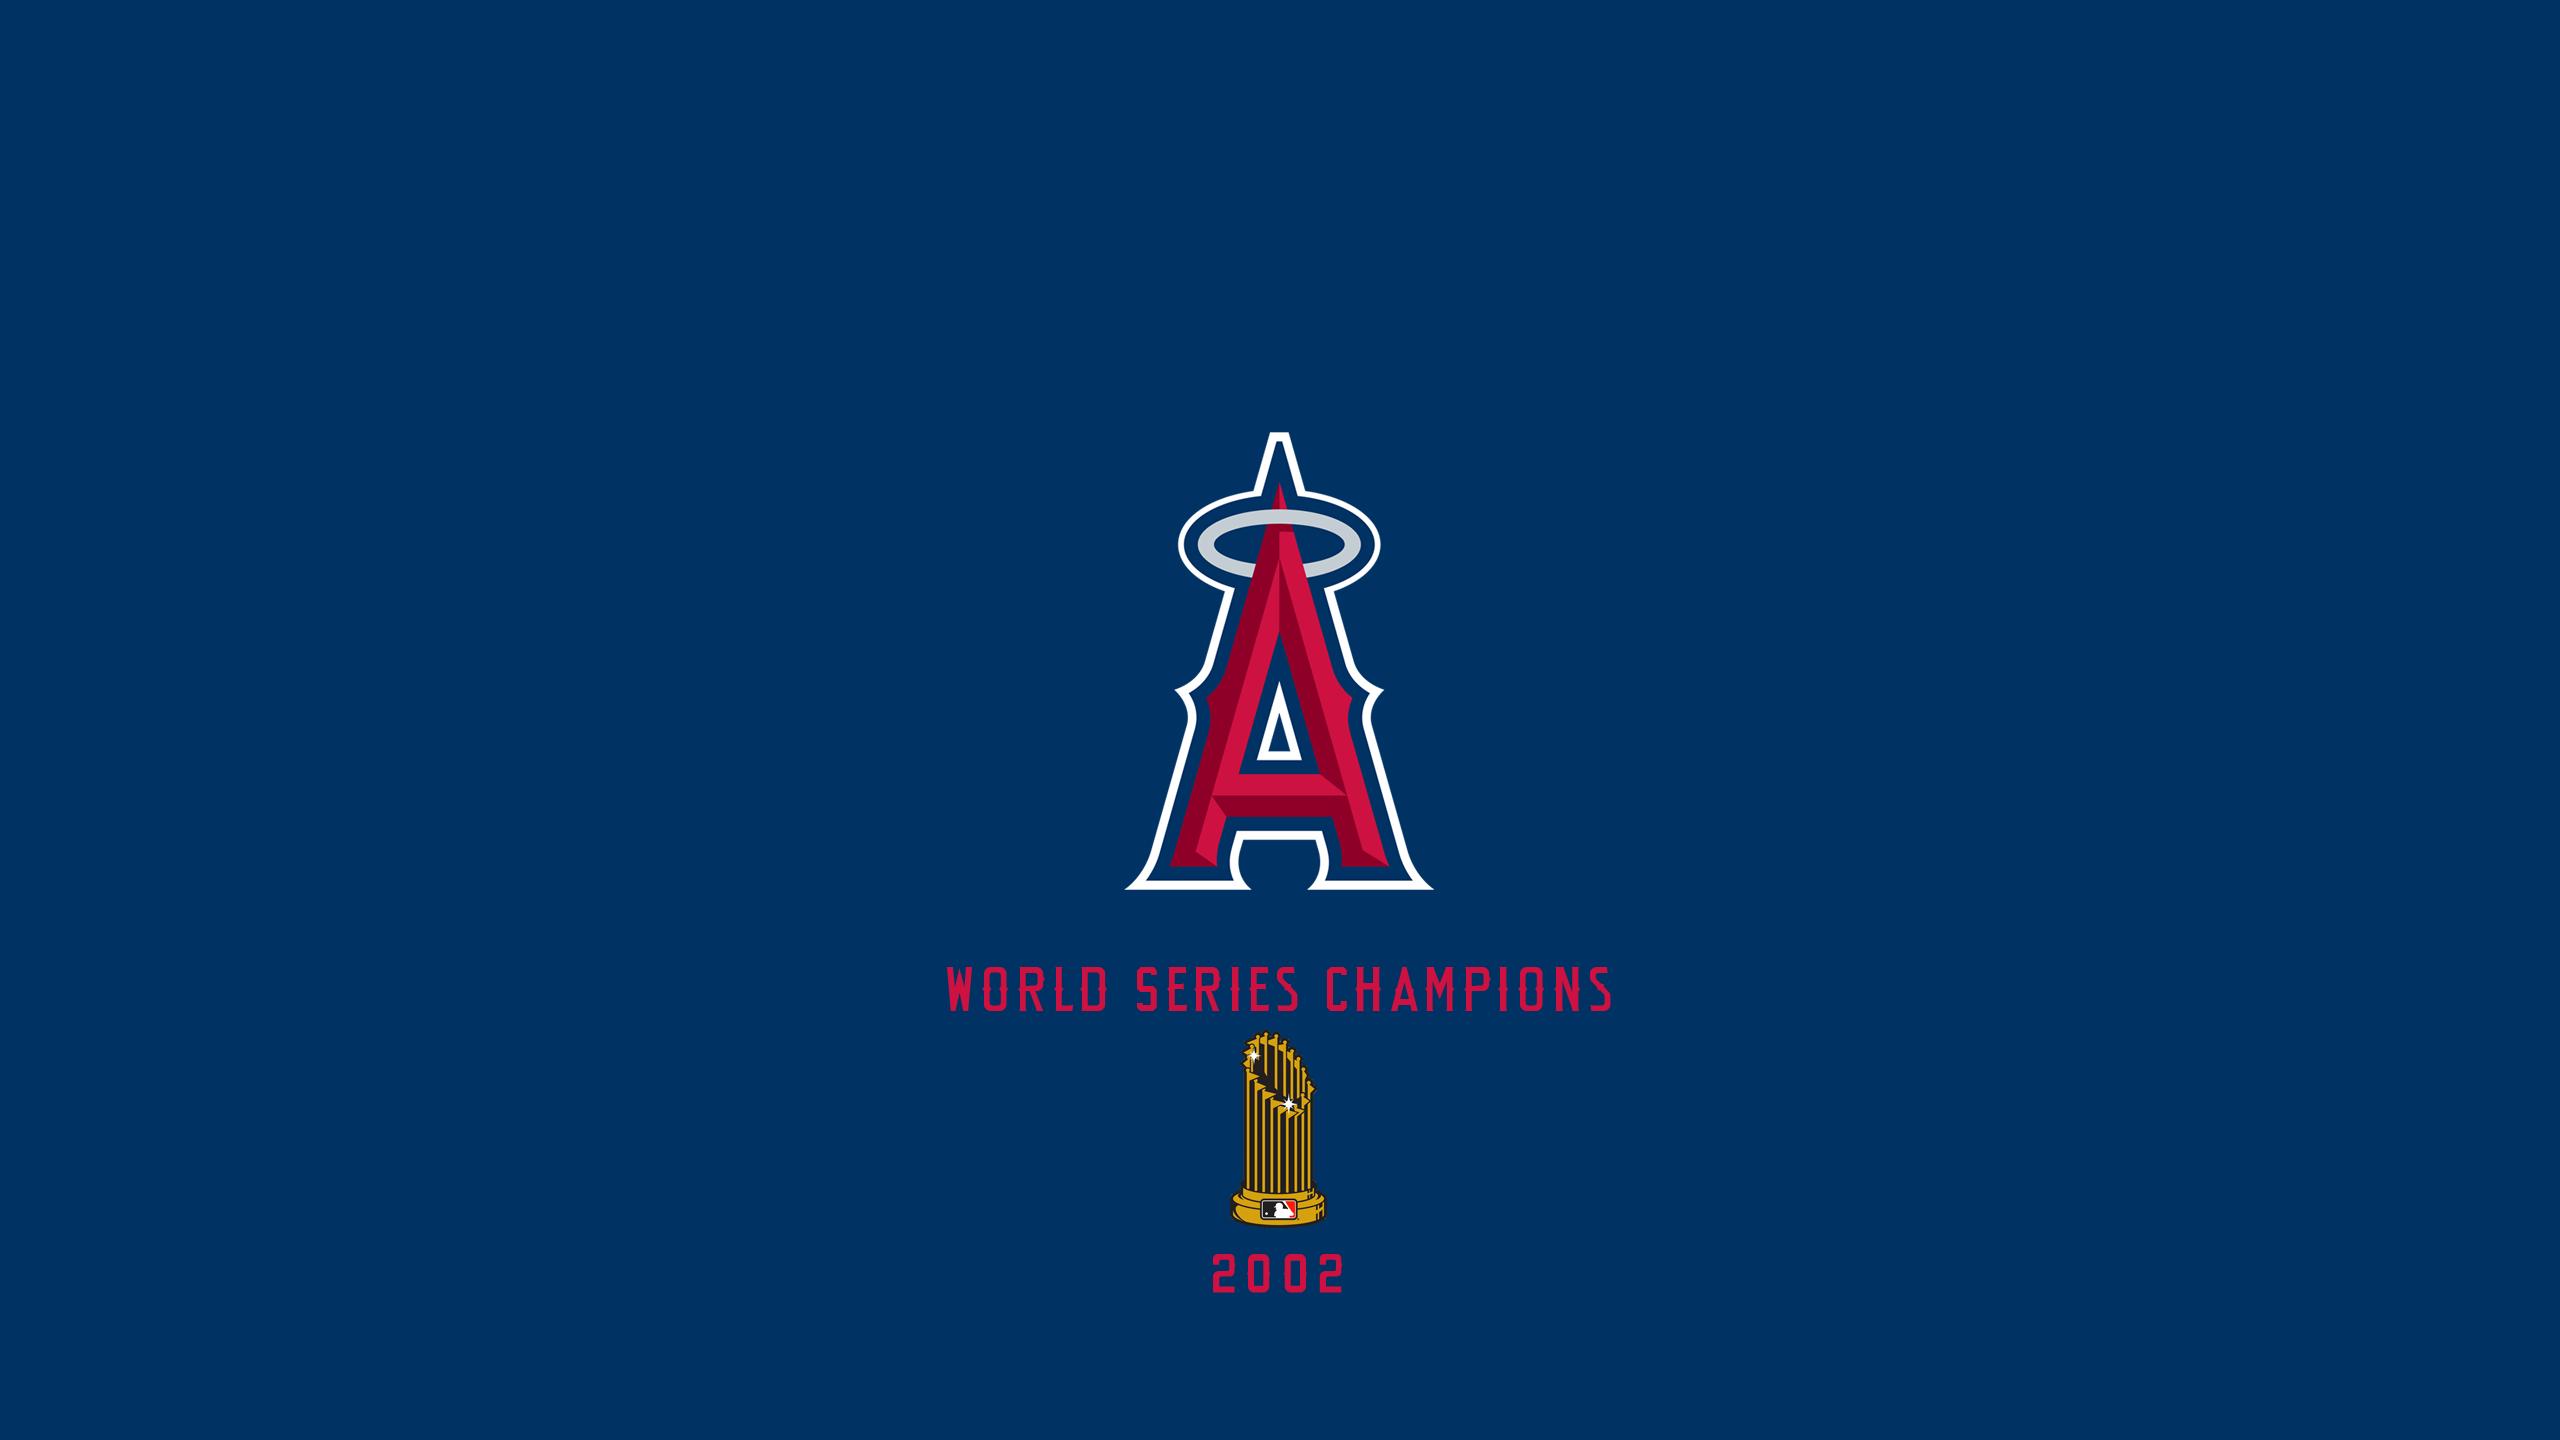 Anaheim Angels - World Series Champs